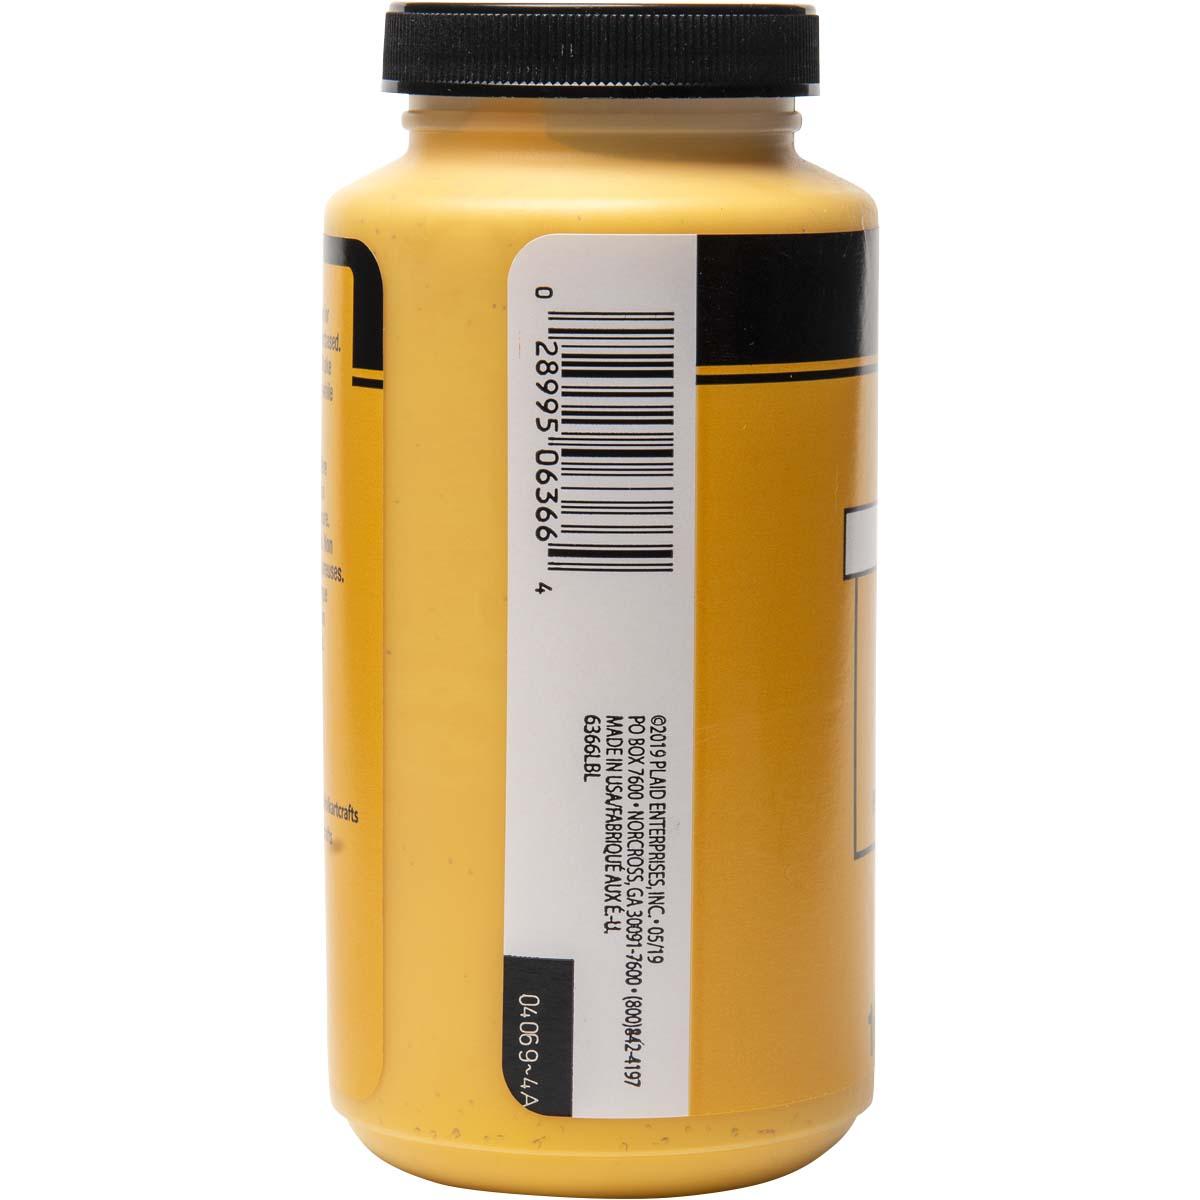 FolkArt ® Acrylic Colors - School Bus Yellow, 16 oz.